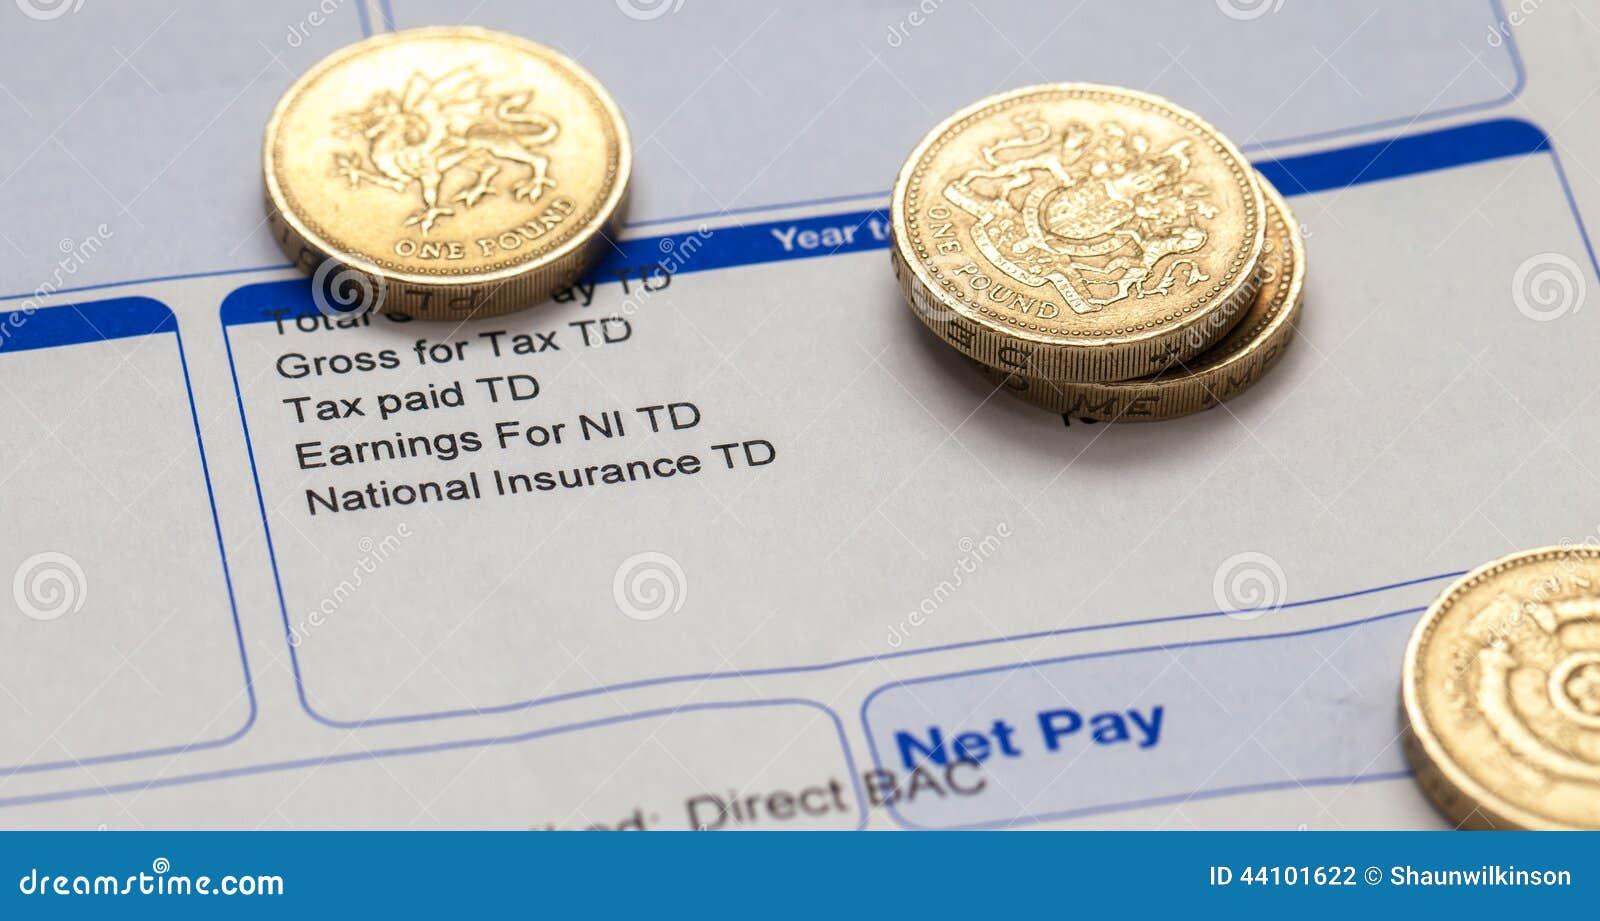 graphical salary slip